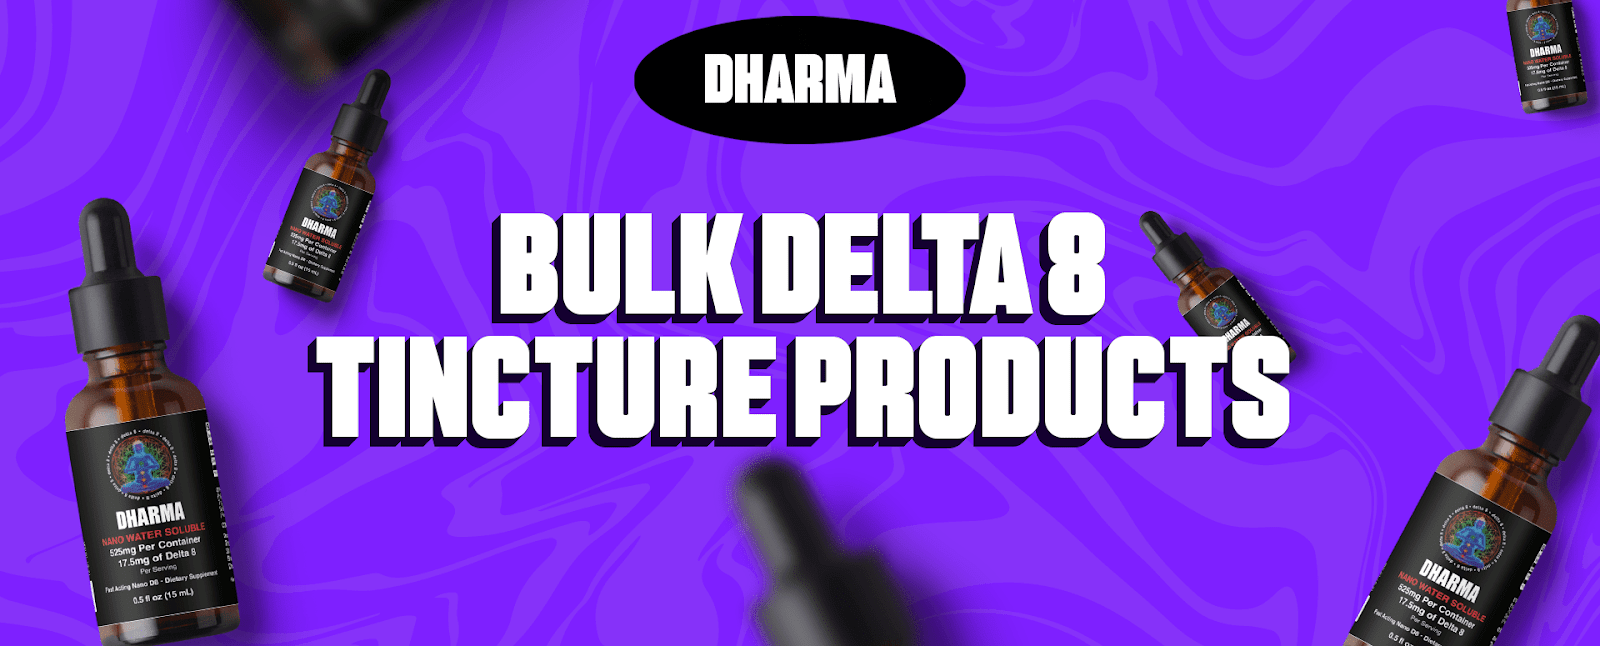 Bulk Delta 8 Tinctures